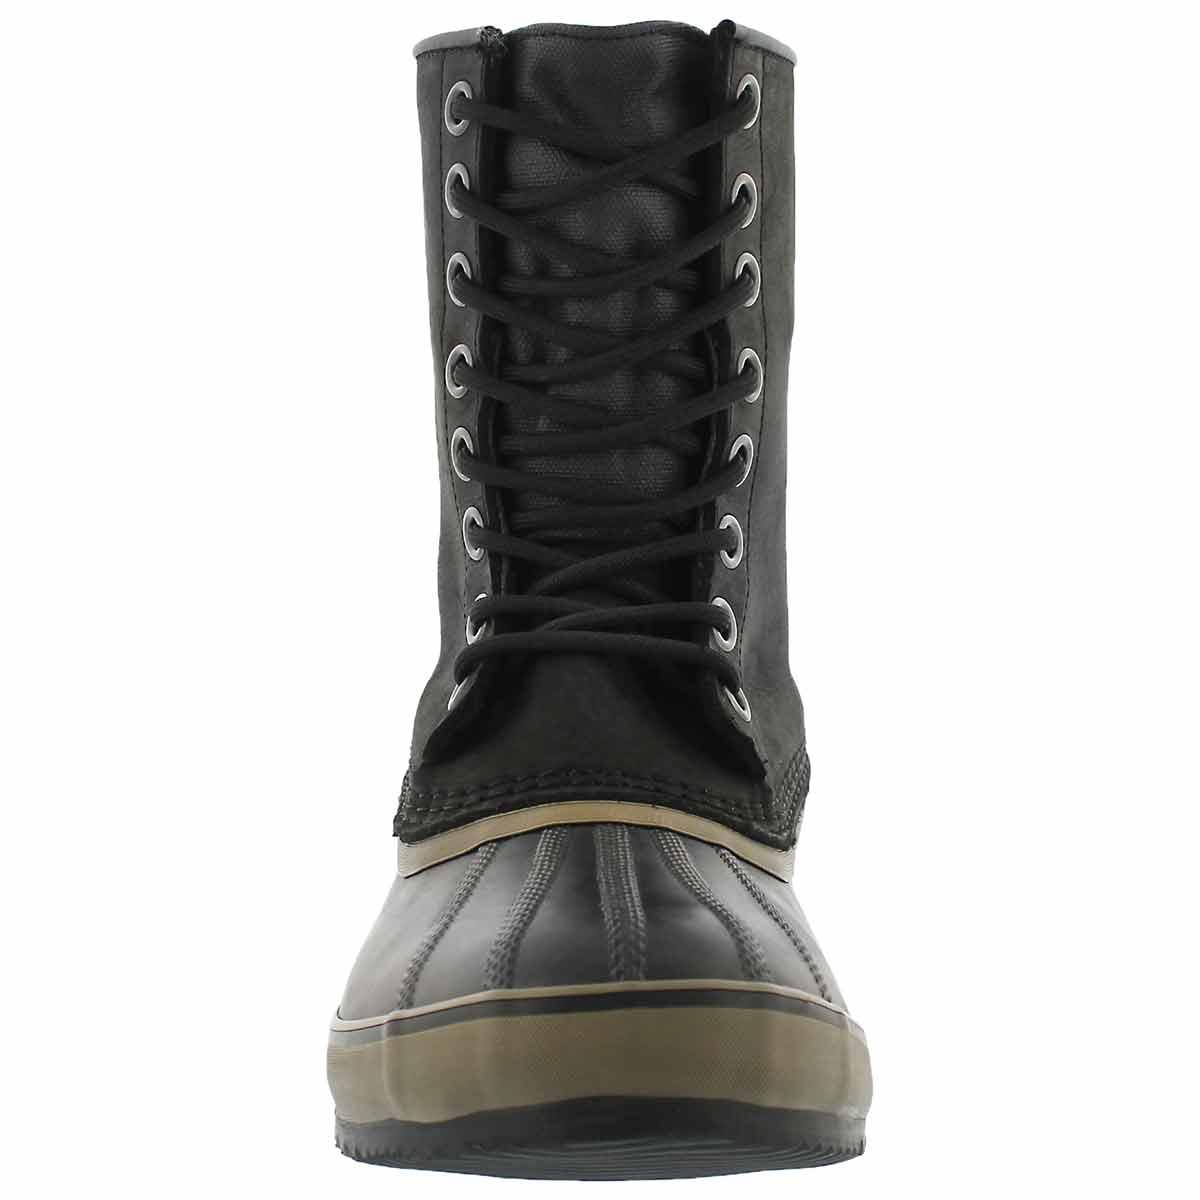 Mns 1964 Premium blk wtpf winter boot